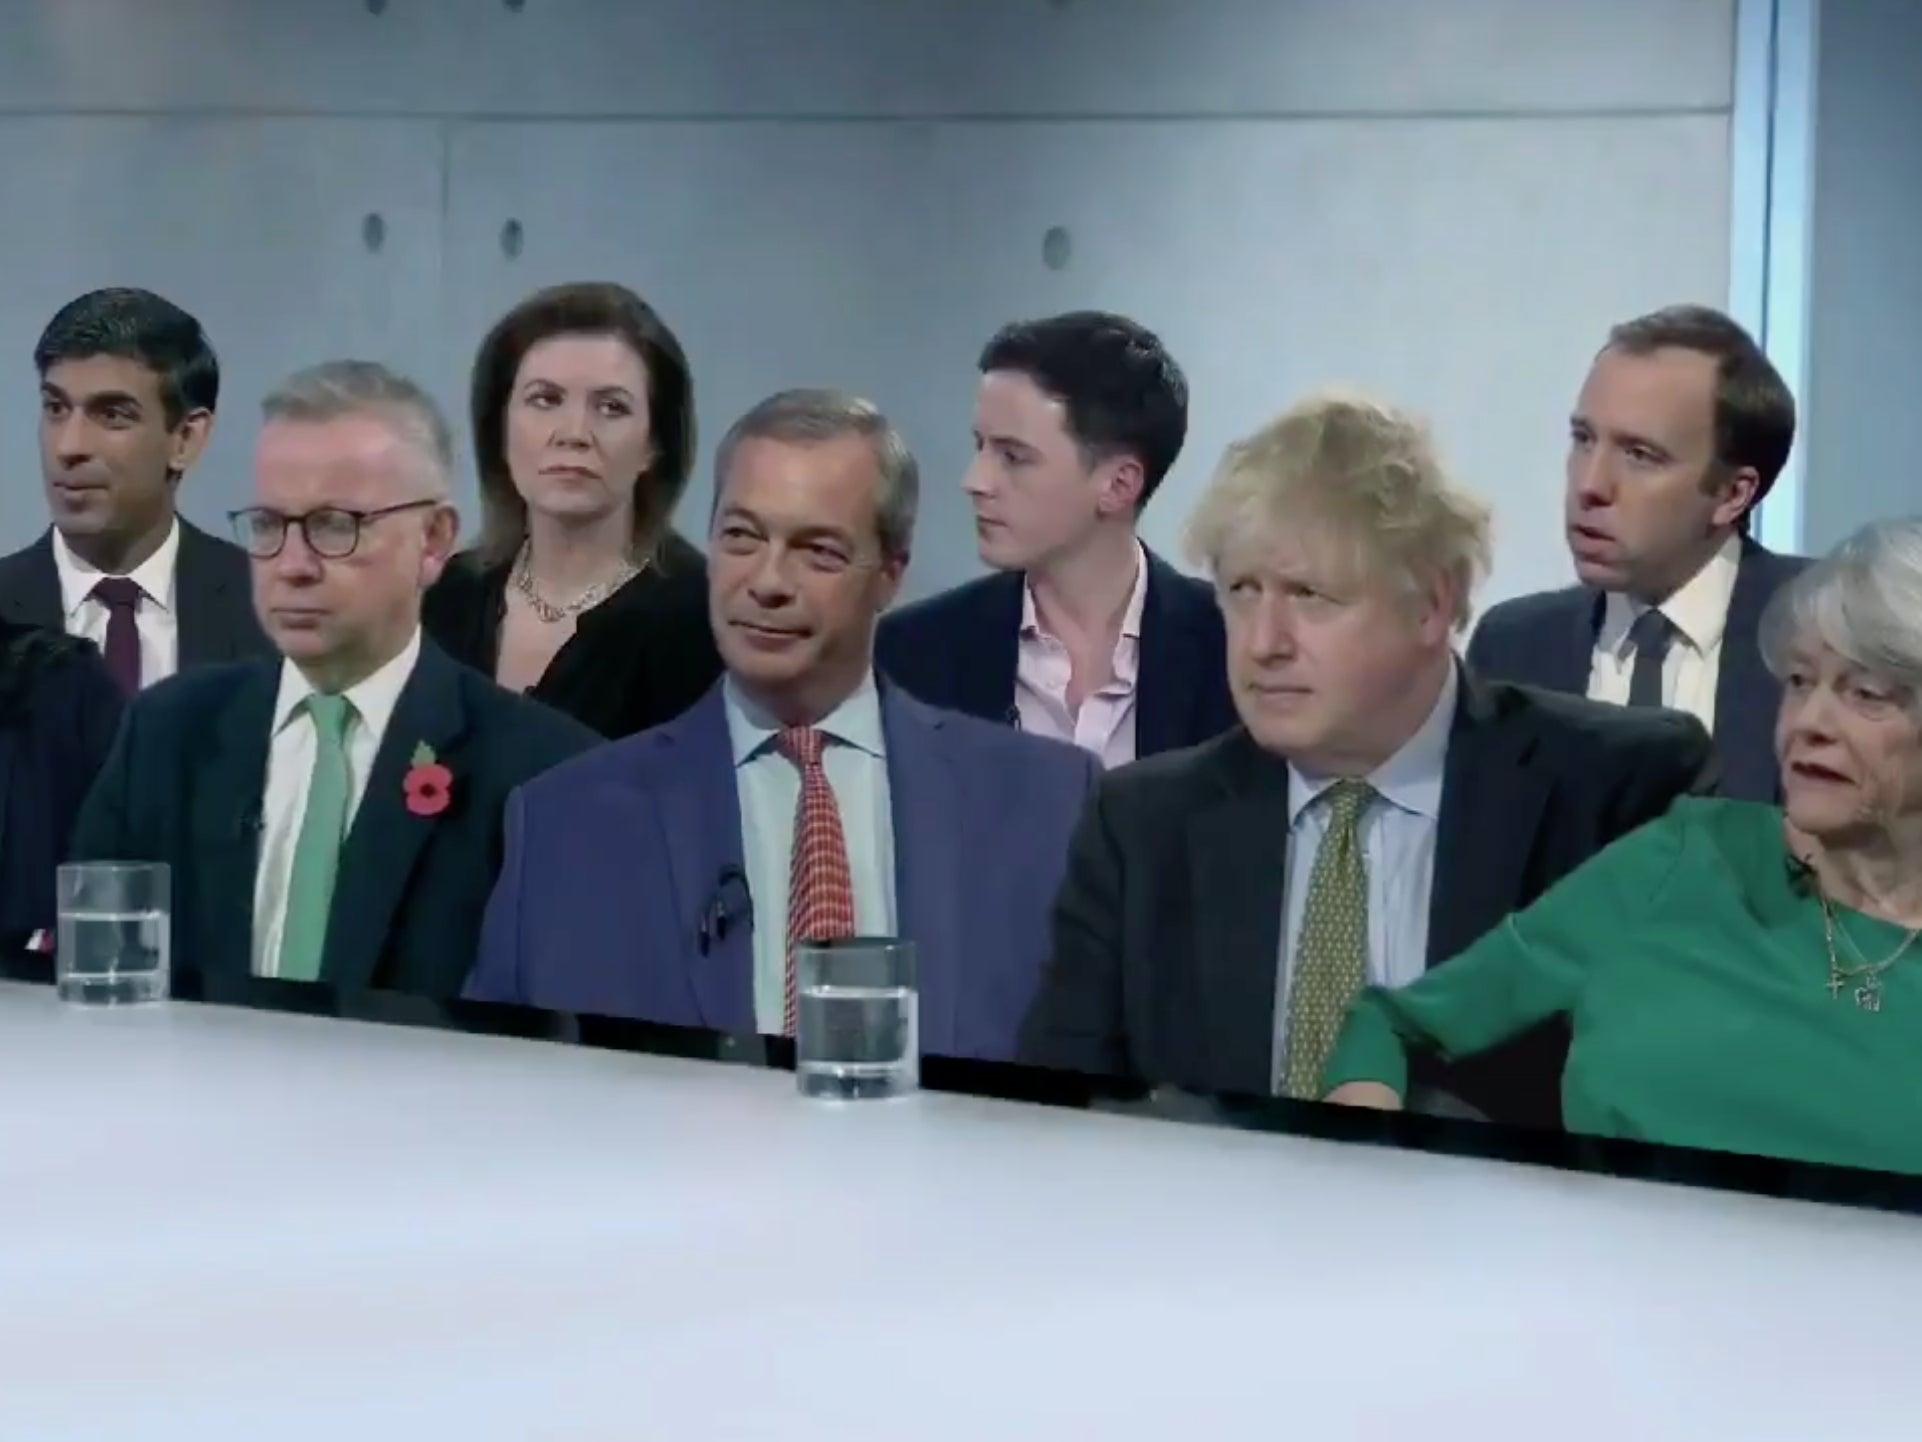 Brutal sketch reimagines Tories as Apprentice candidates